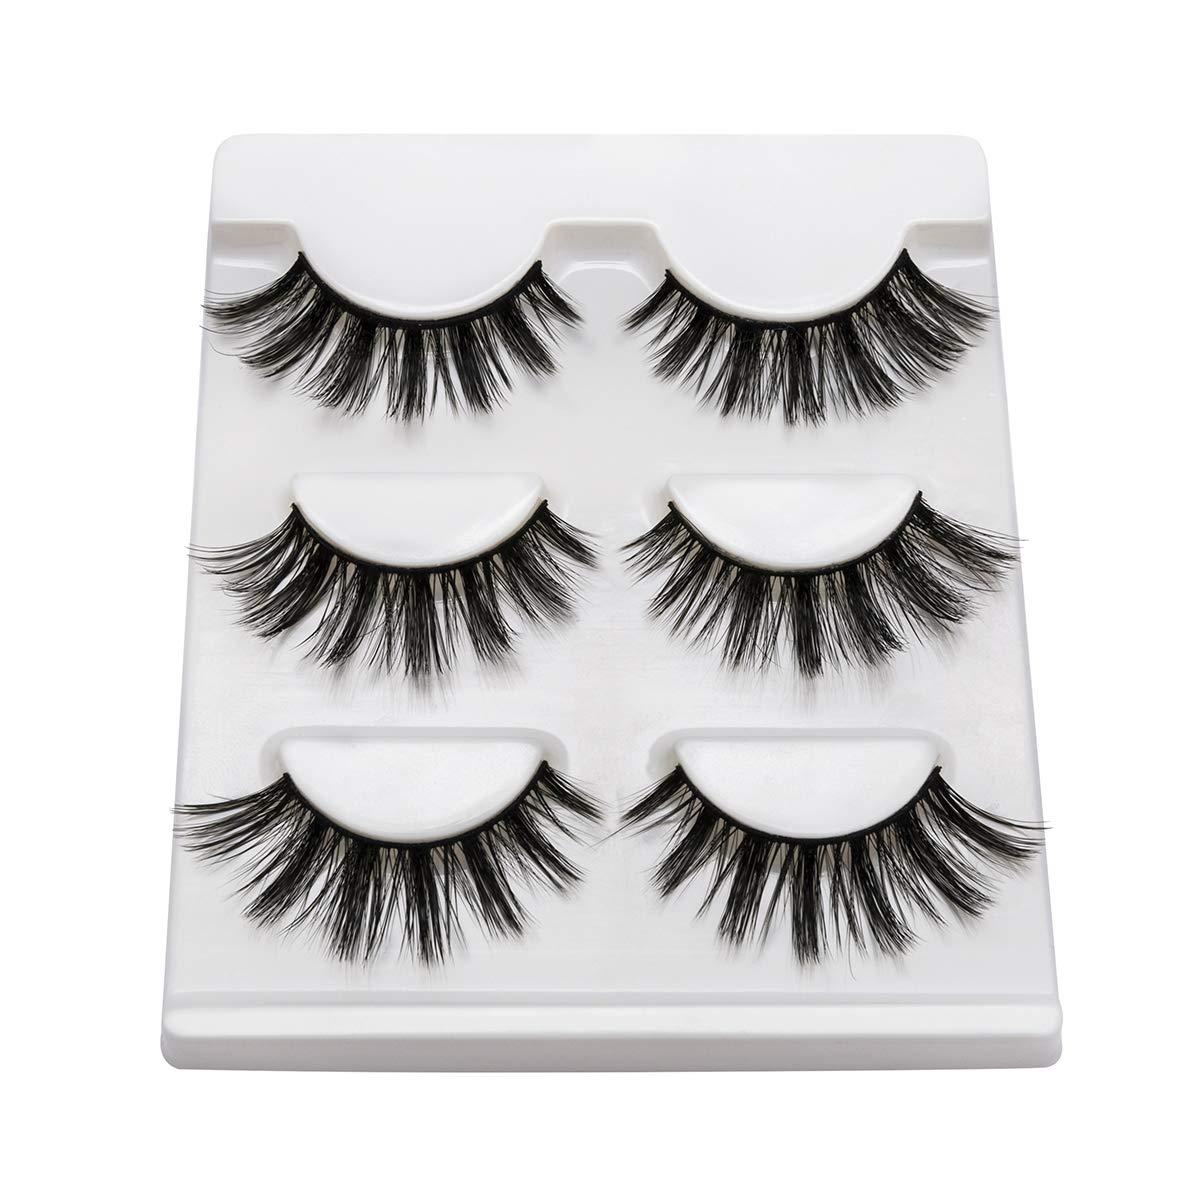 DYSILK 3D Mink Fake Eyelashes Fluffy Ffalse Eyelashes Natural Look Eyelashes Handmade Extension Thick Long Reusable Soft Lashes Makeup Black 3 Pairs